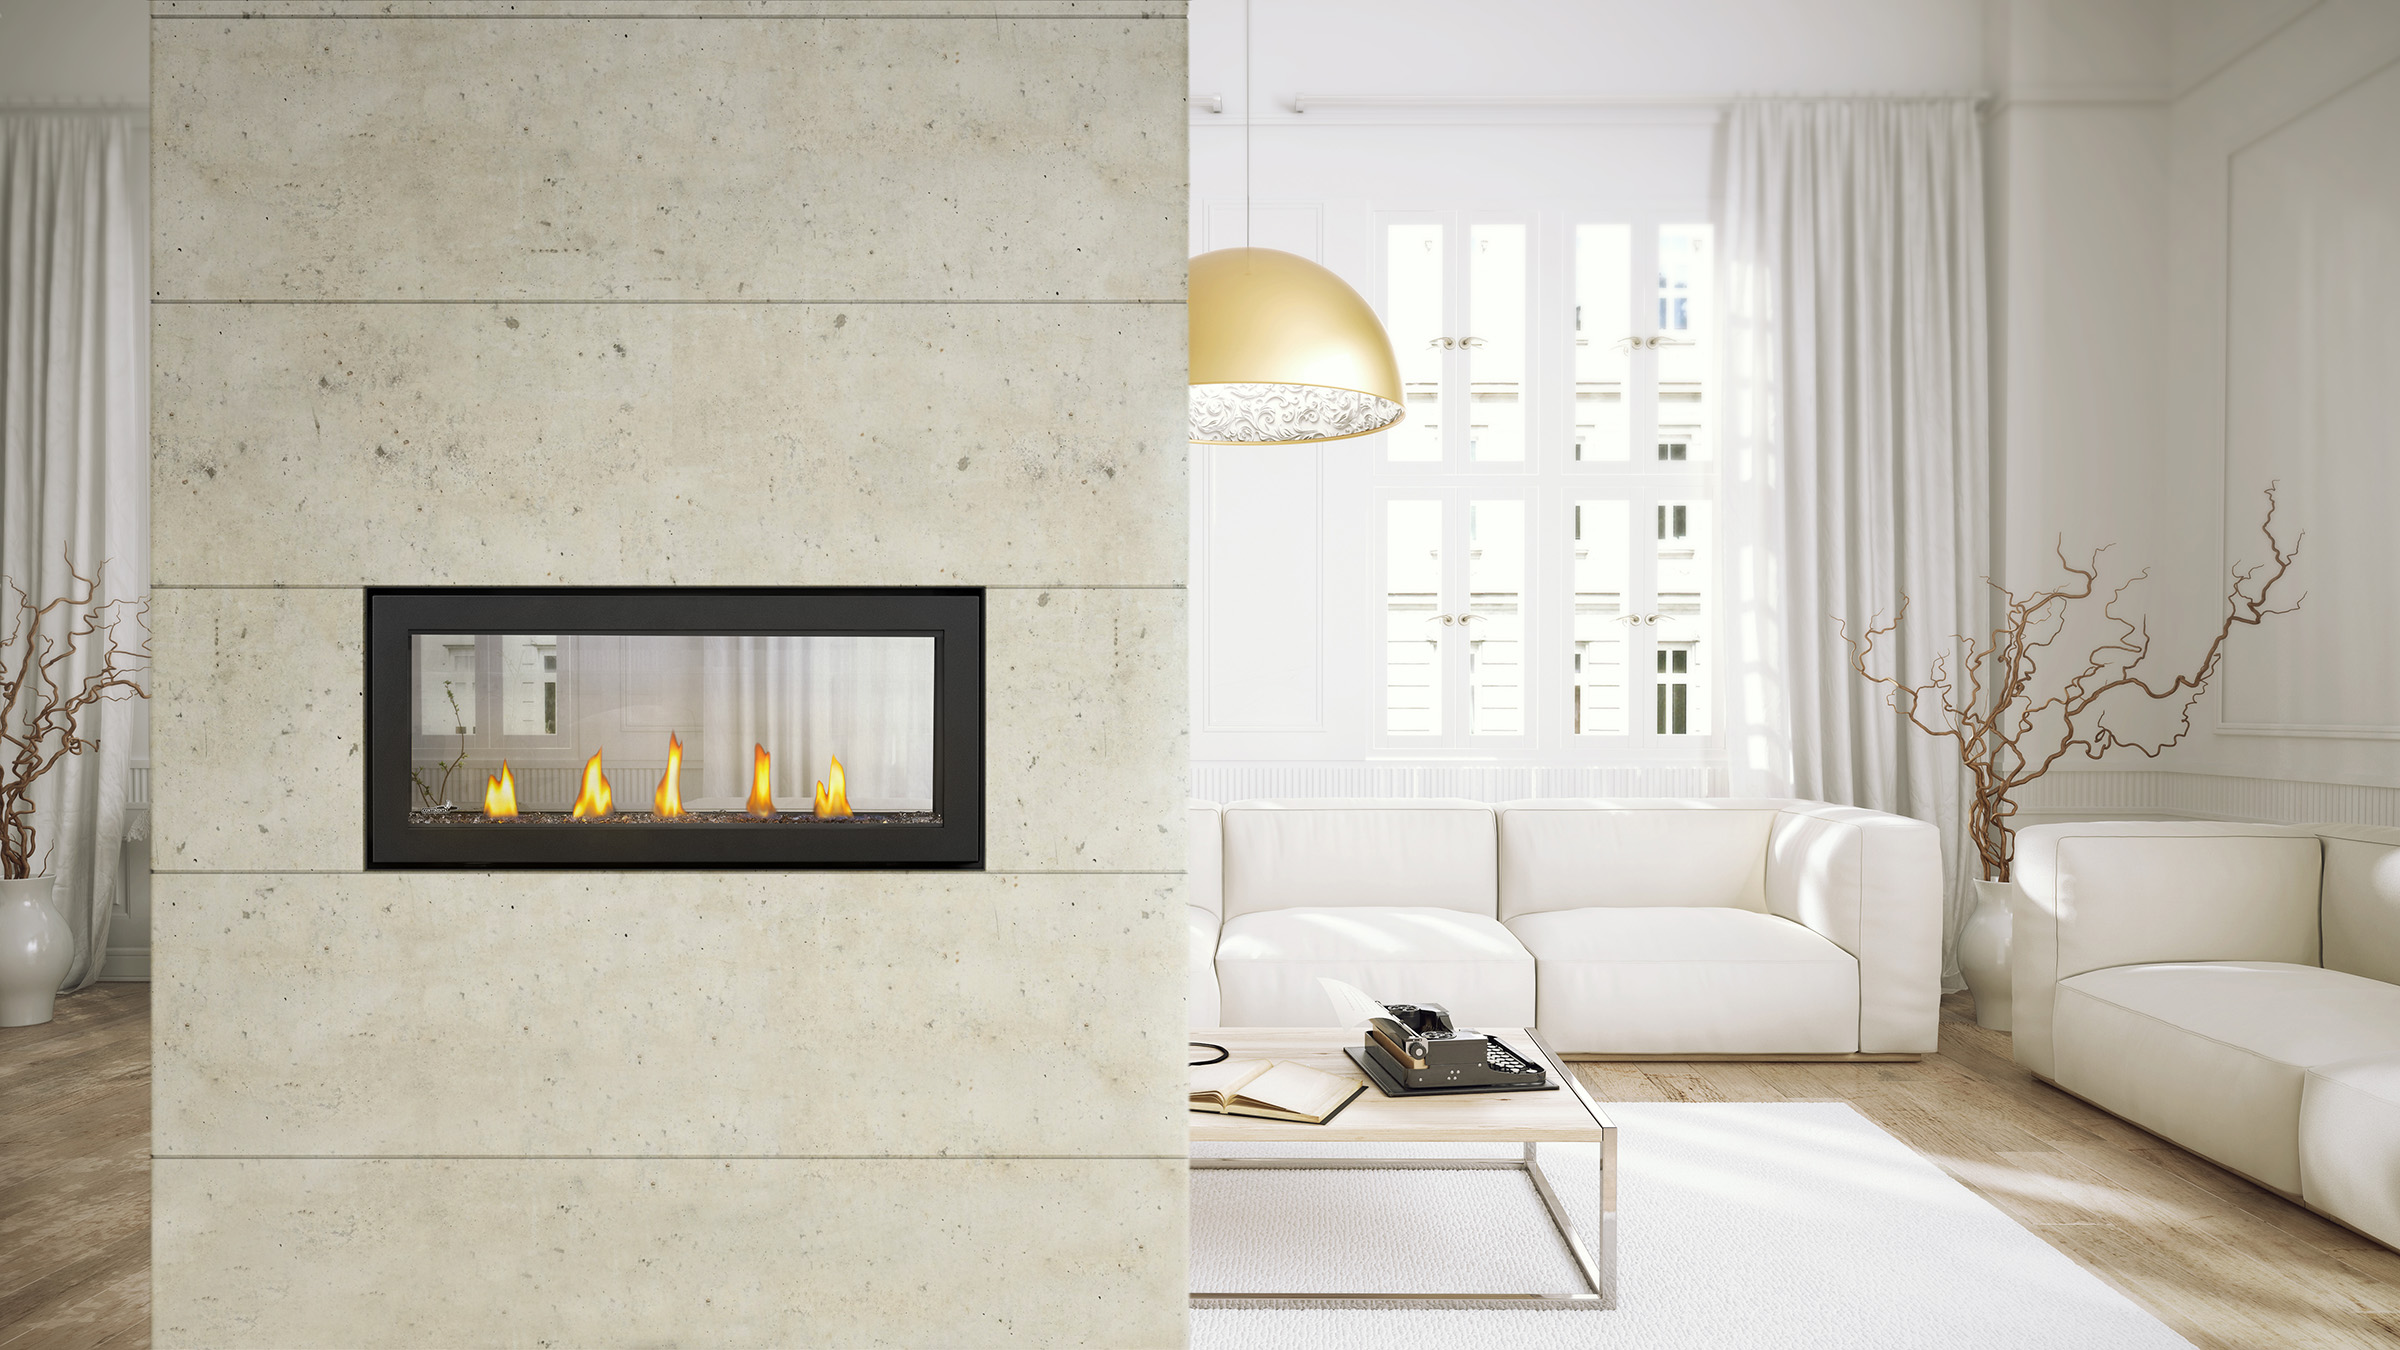 CL38-Roomset-Livingroom (1).jpg